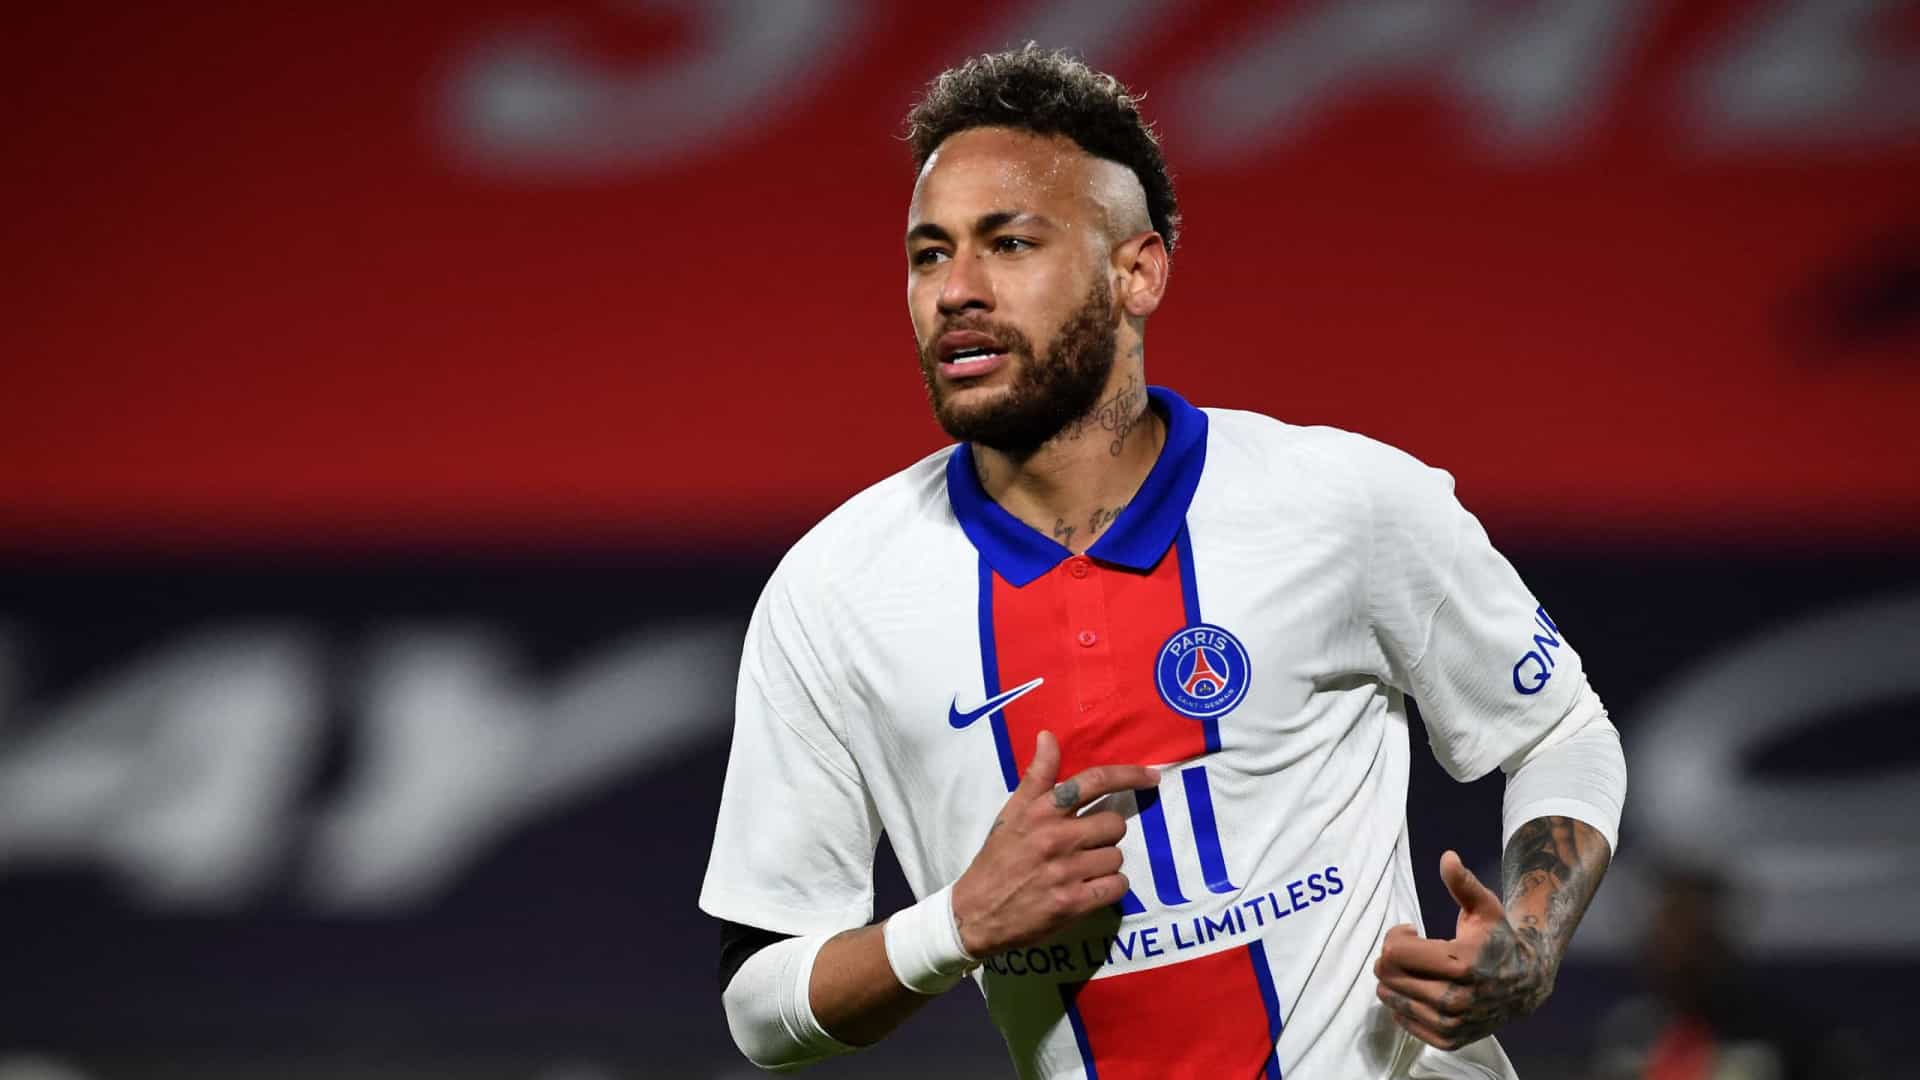 Neymar esconde símbolo da Nike após ser acusado de ataque sexual